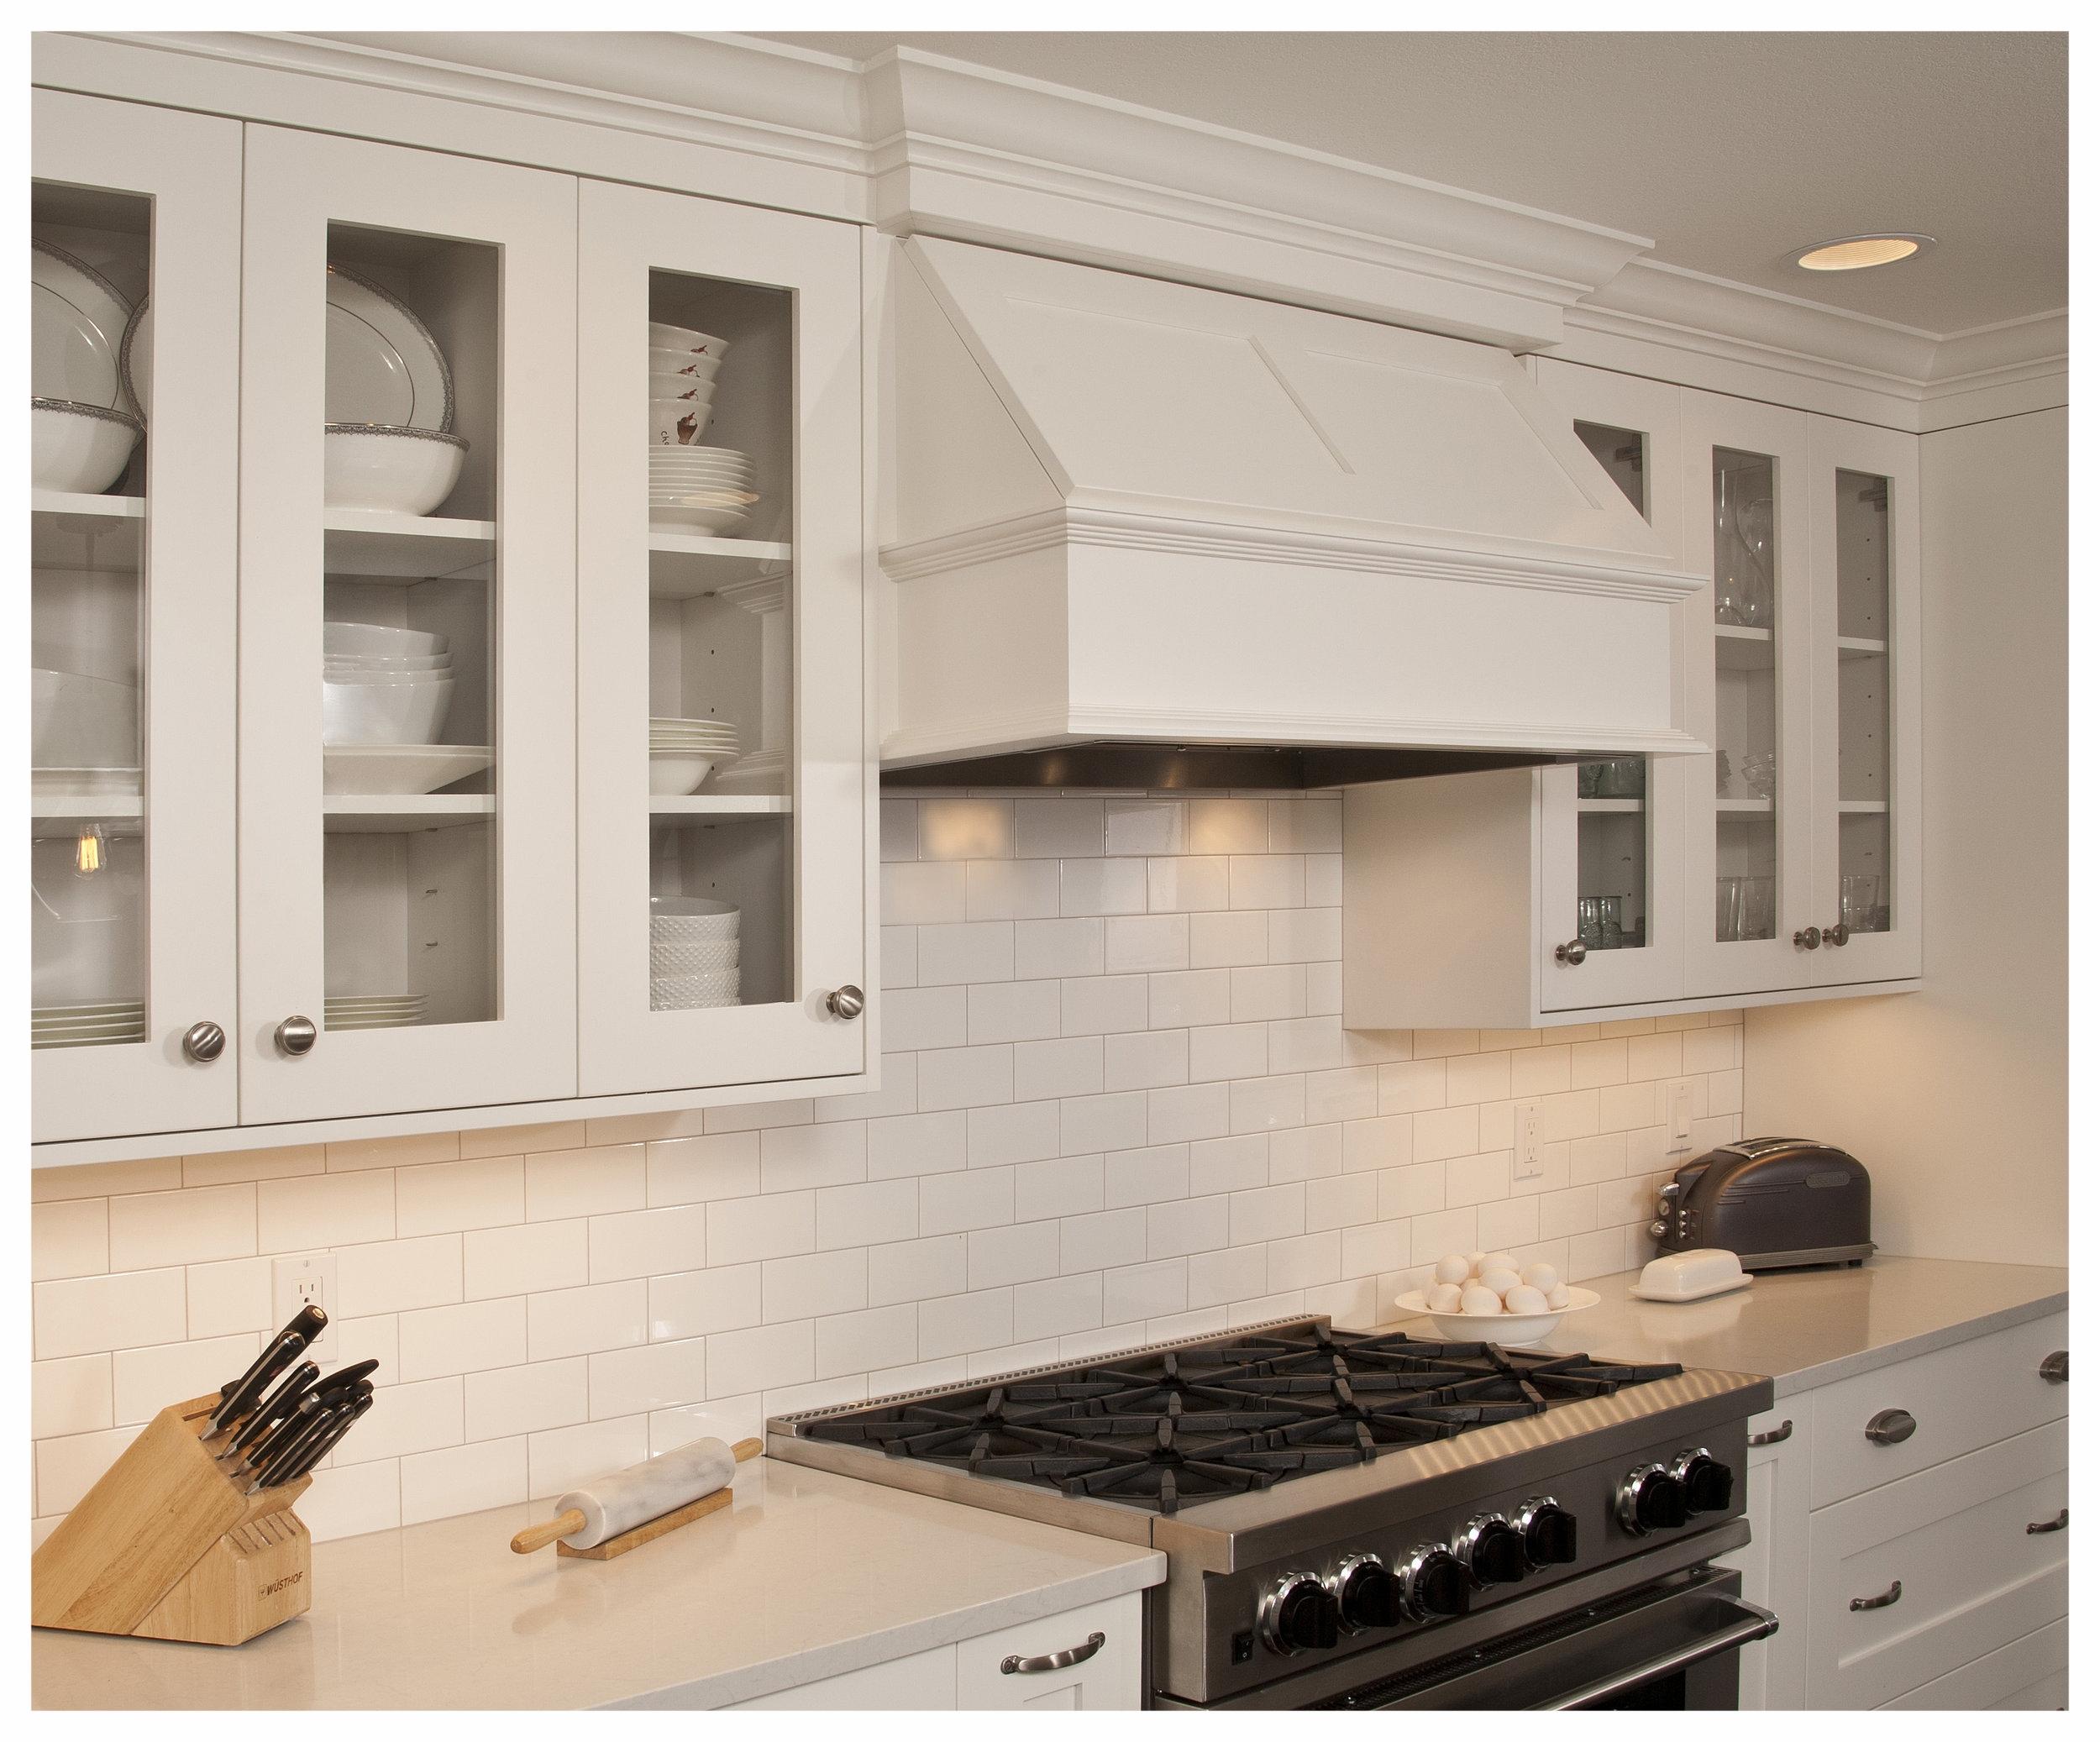 English Hill Transitional Kitchen 10.jpg